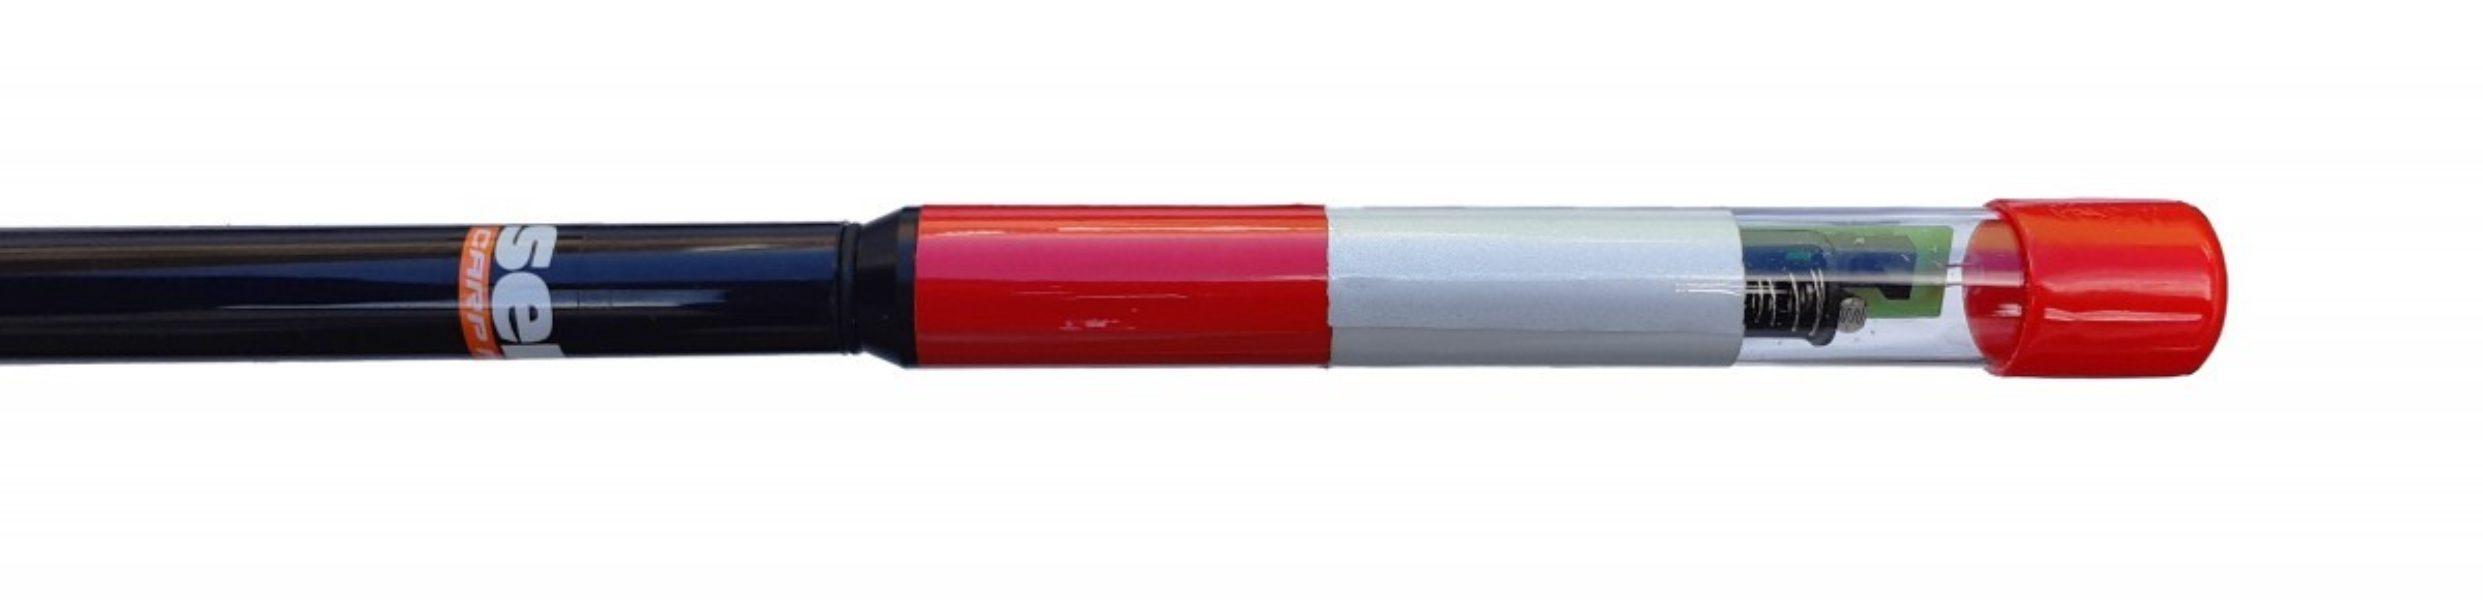 1200x1200 15535021446 sklopna sroubovaci tycova bojka sellior se stmivaci diodou 6m